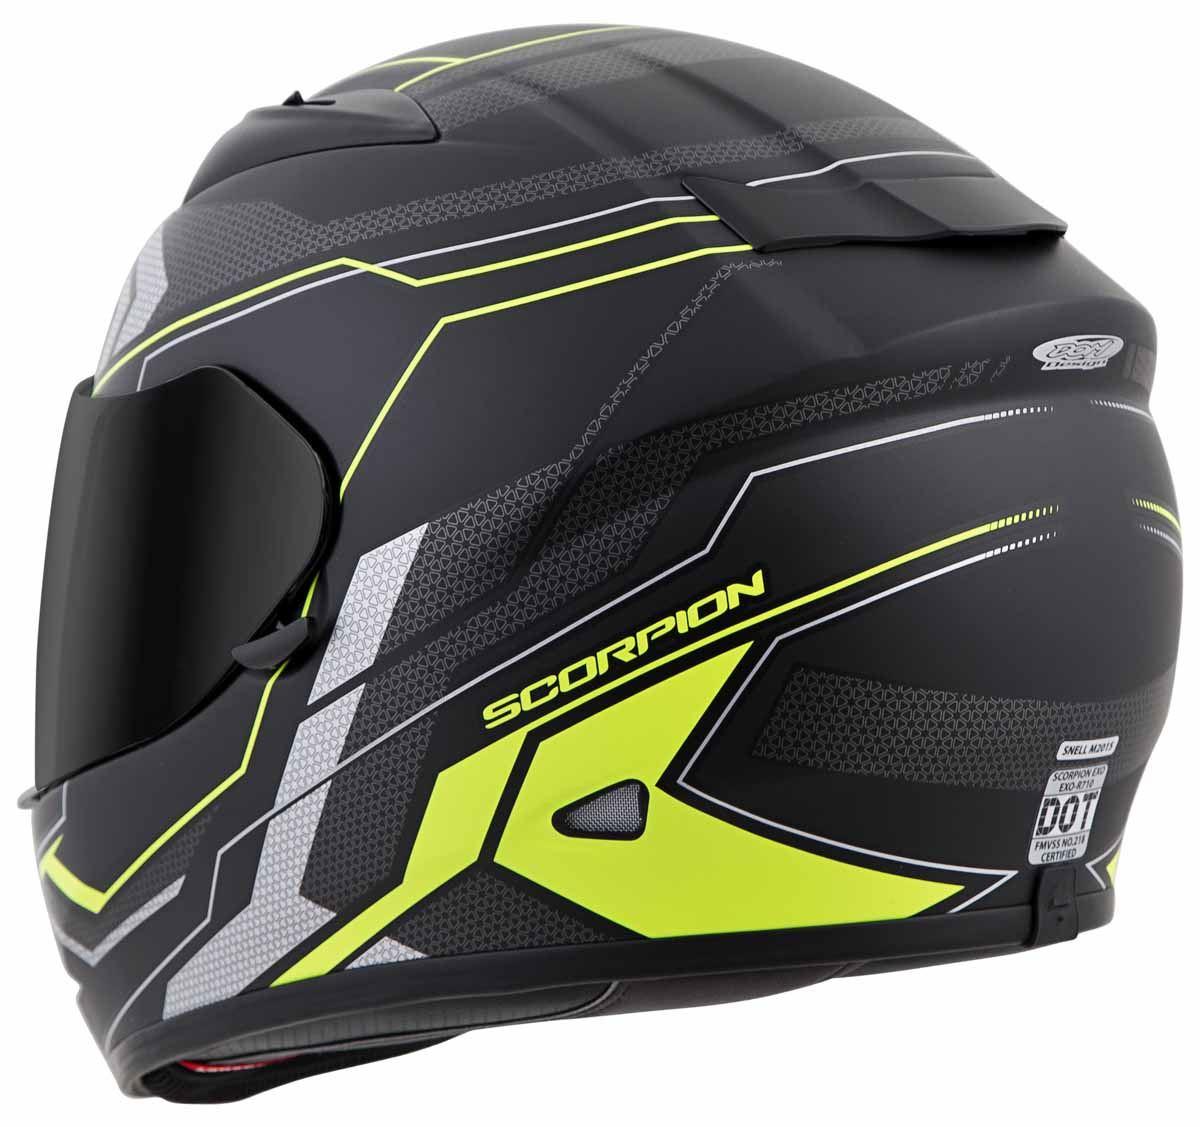 Scorpion-EXO-R710-Helmet-Fiberglass-Full-Face-DOT-SNELL-M2015-Certified-XS-2XL miniature 30